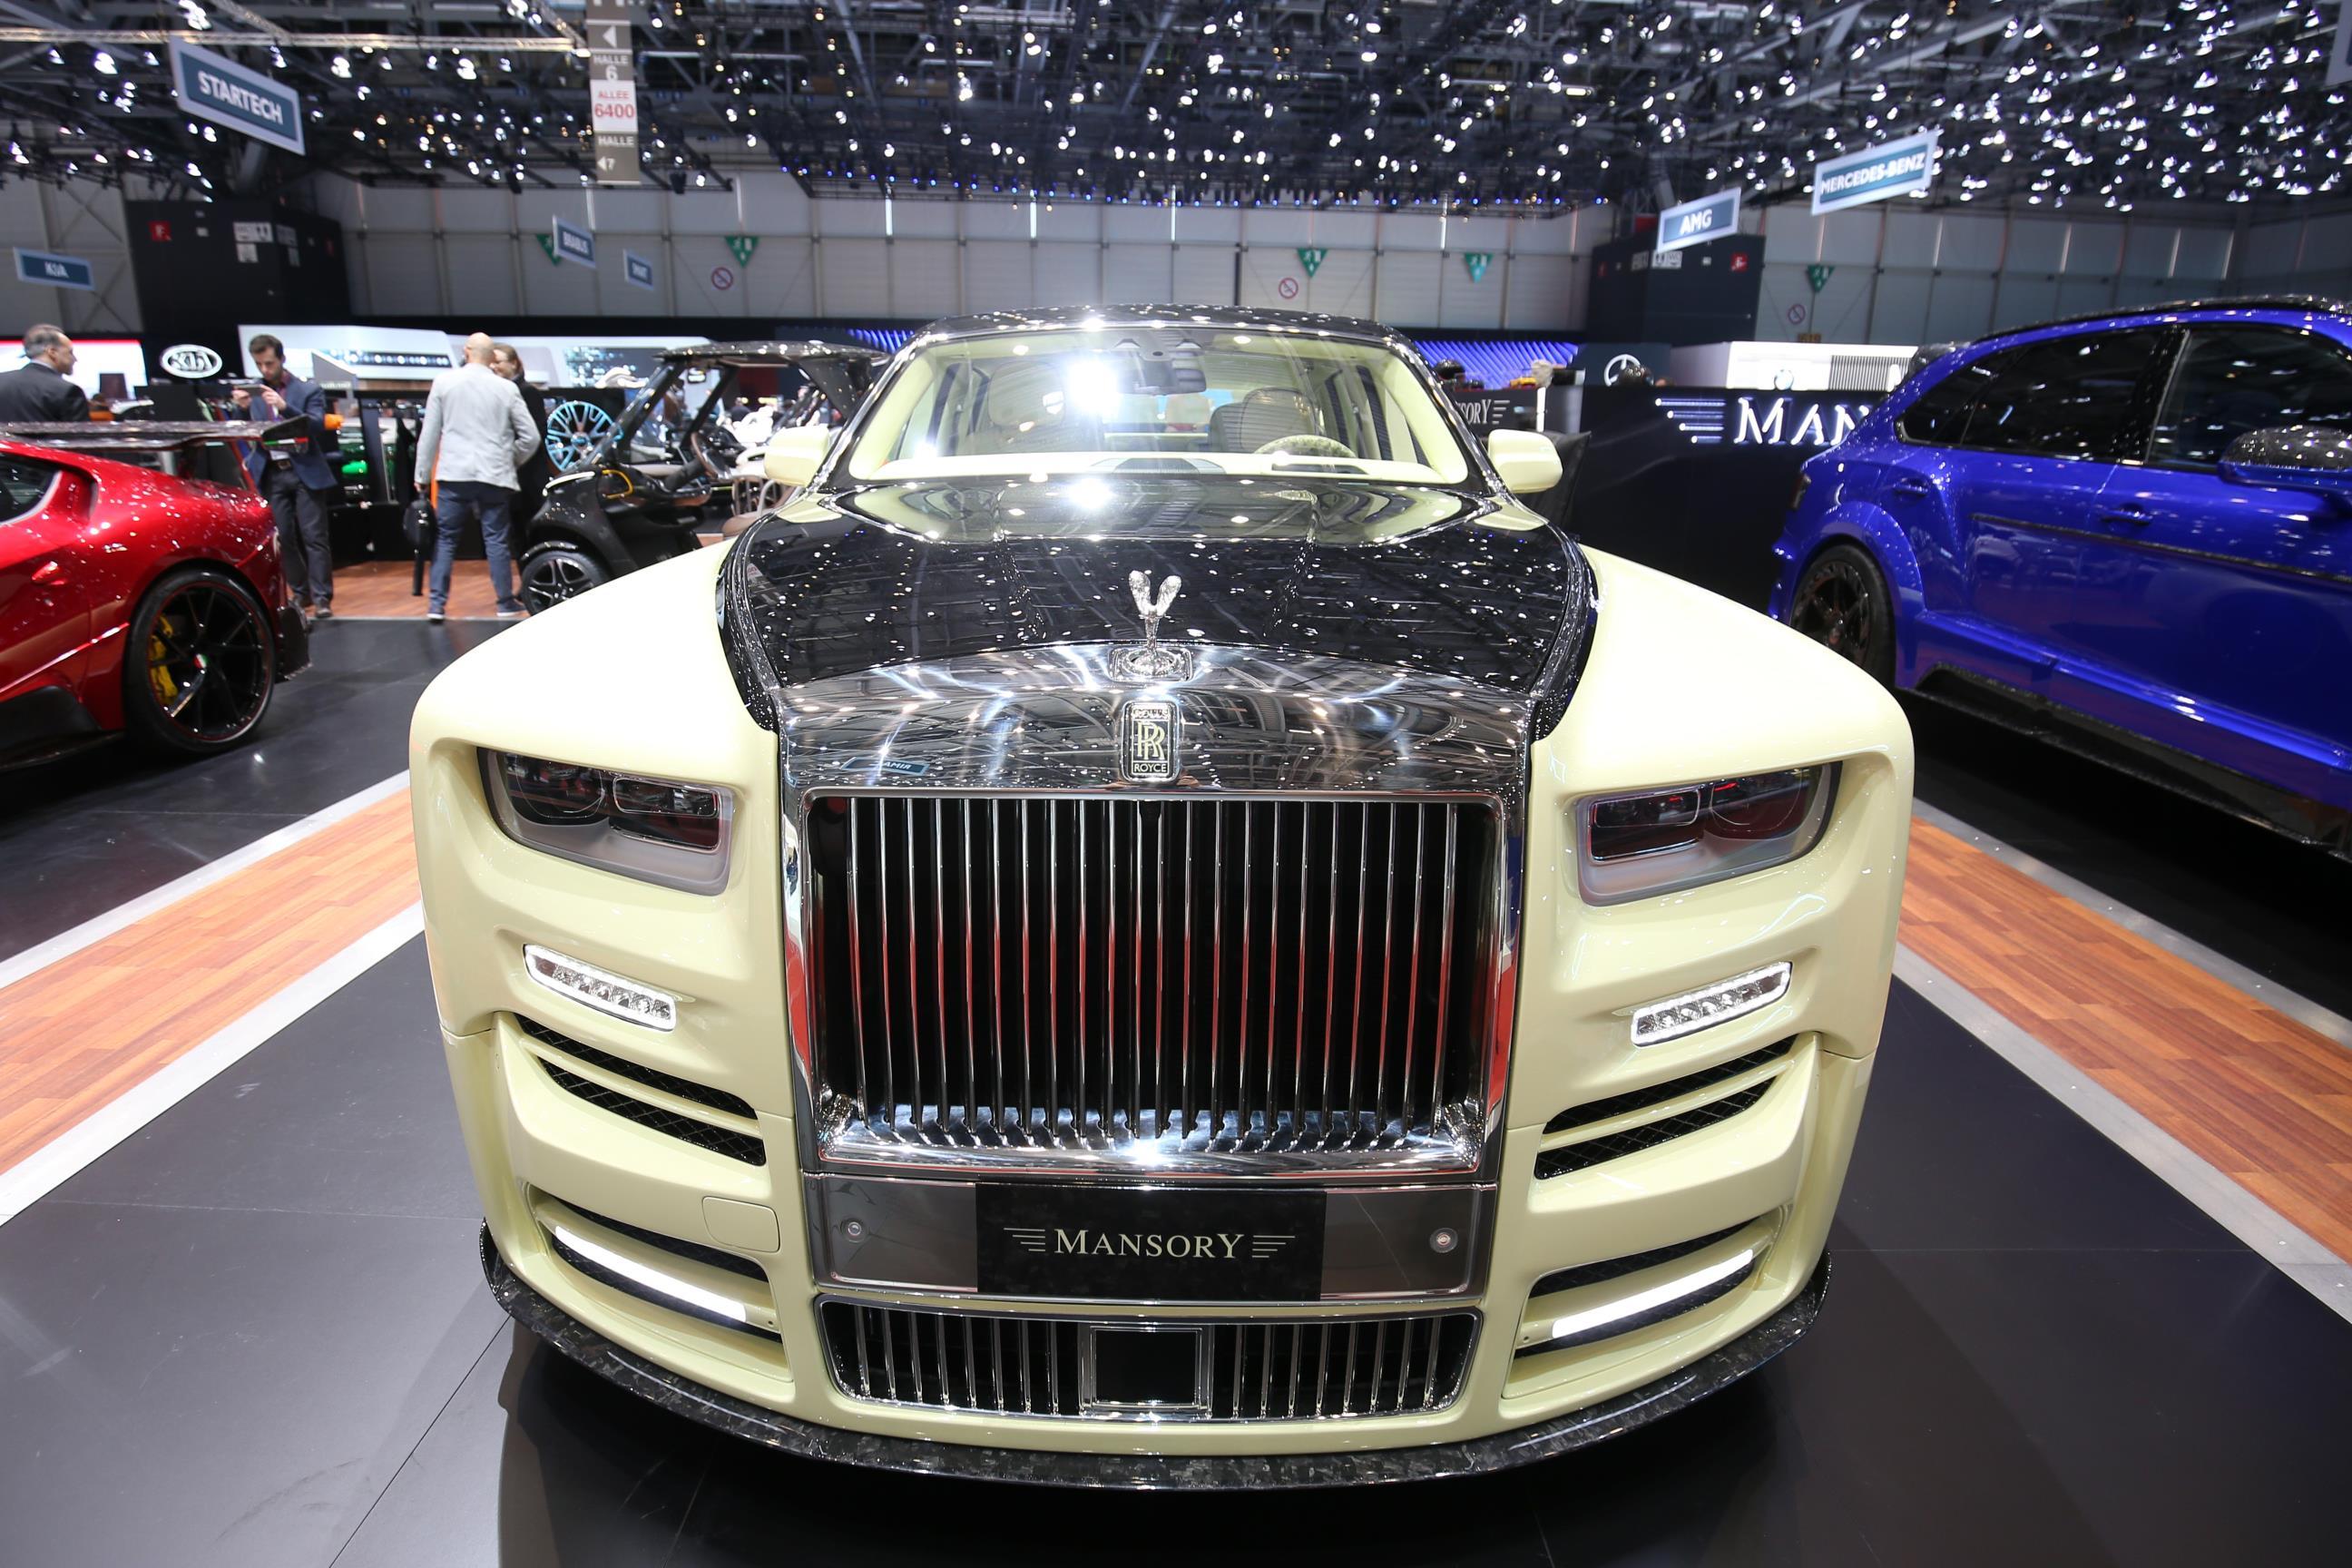 Geneva Motor Show 2018 Mega Gallery Part 2 (284)